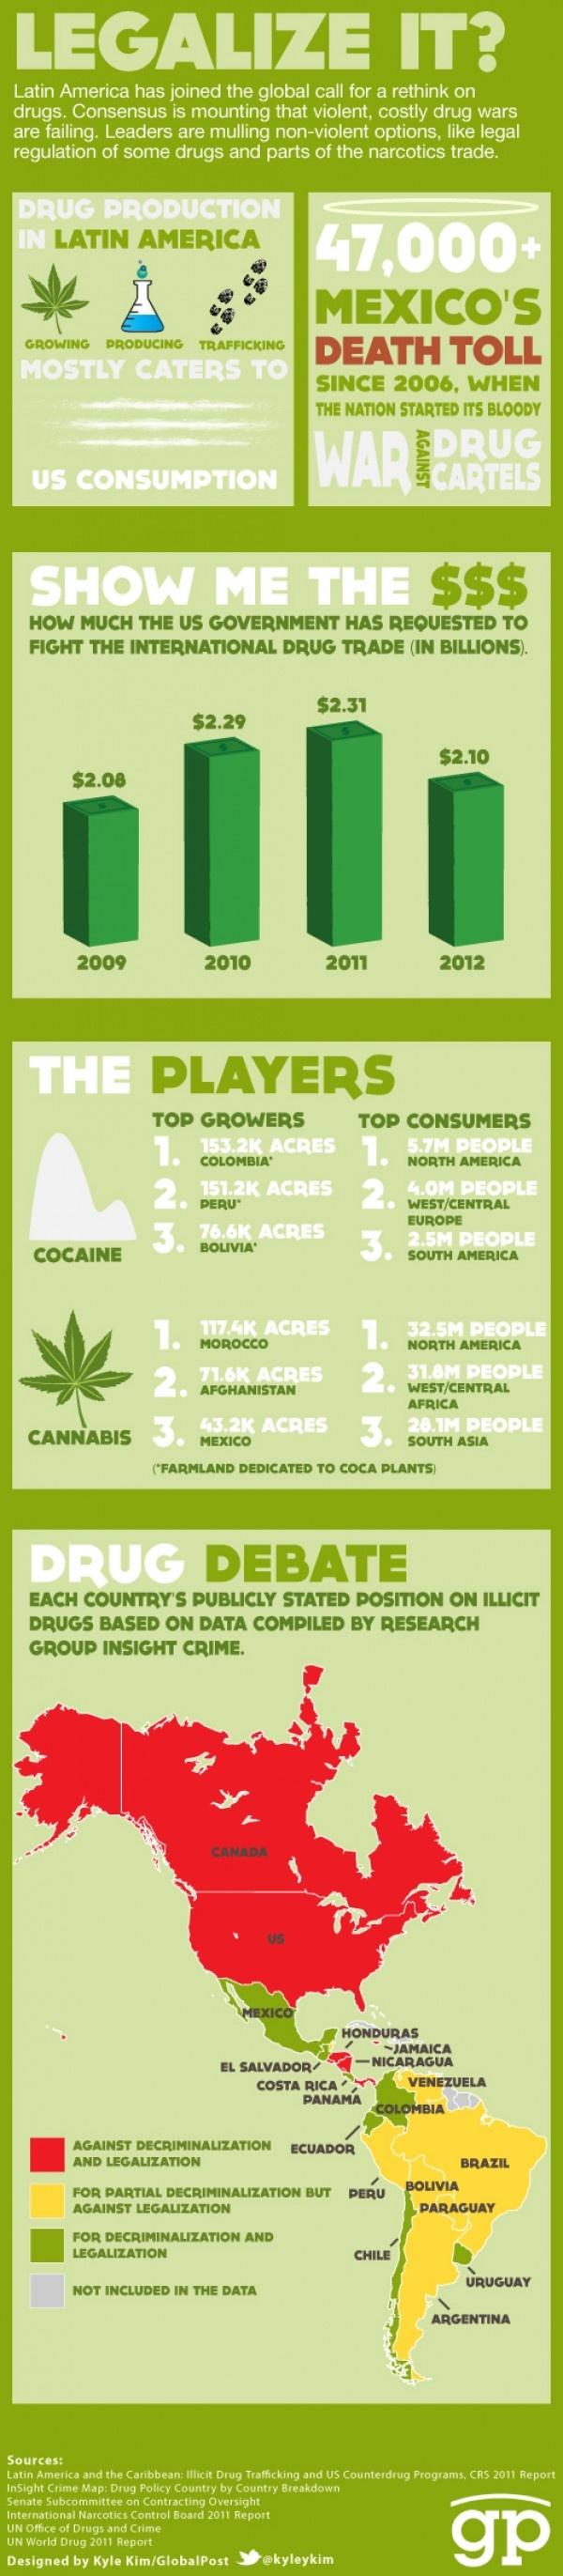 legalization of marijuana thesis